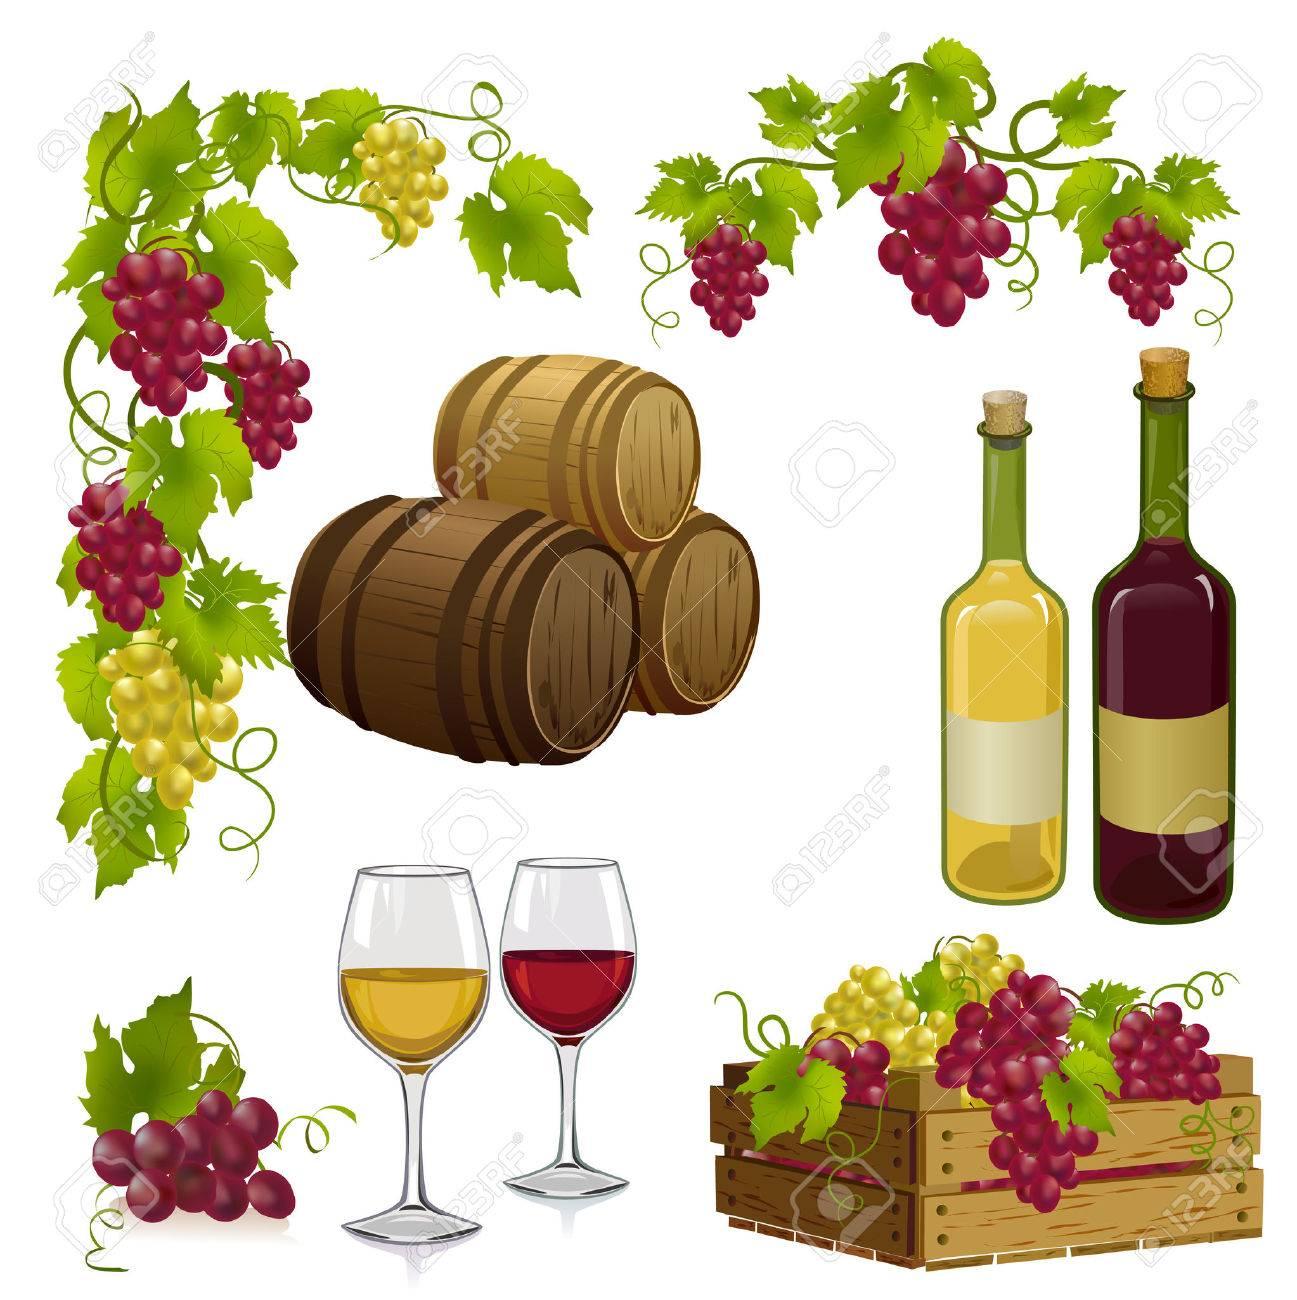 set for winemaking. Standard-Bild - 26546233